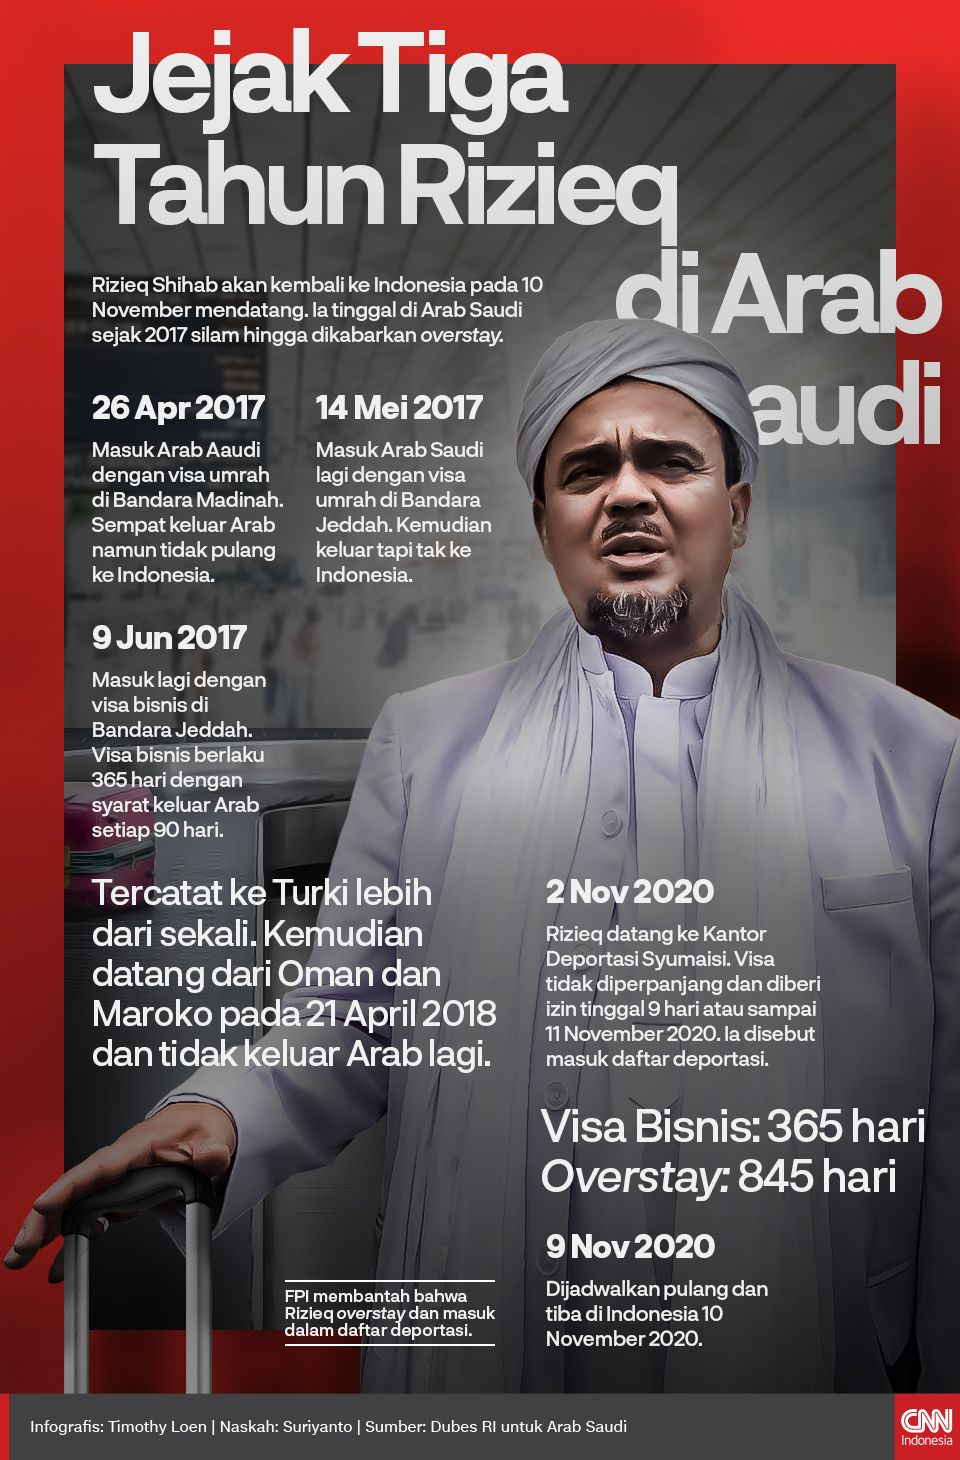 Infografis Jejak Tiga Tahun Rizieq di Arab Saudi